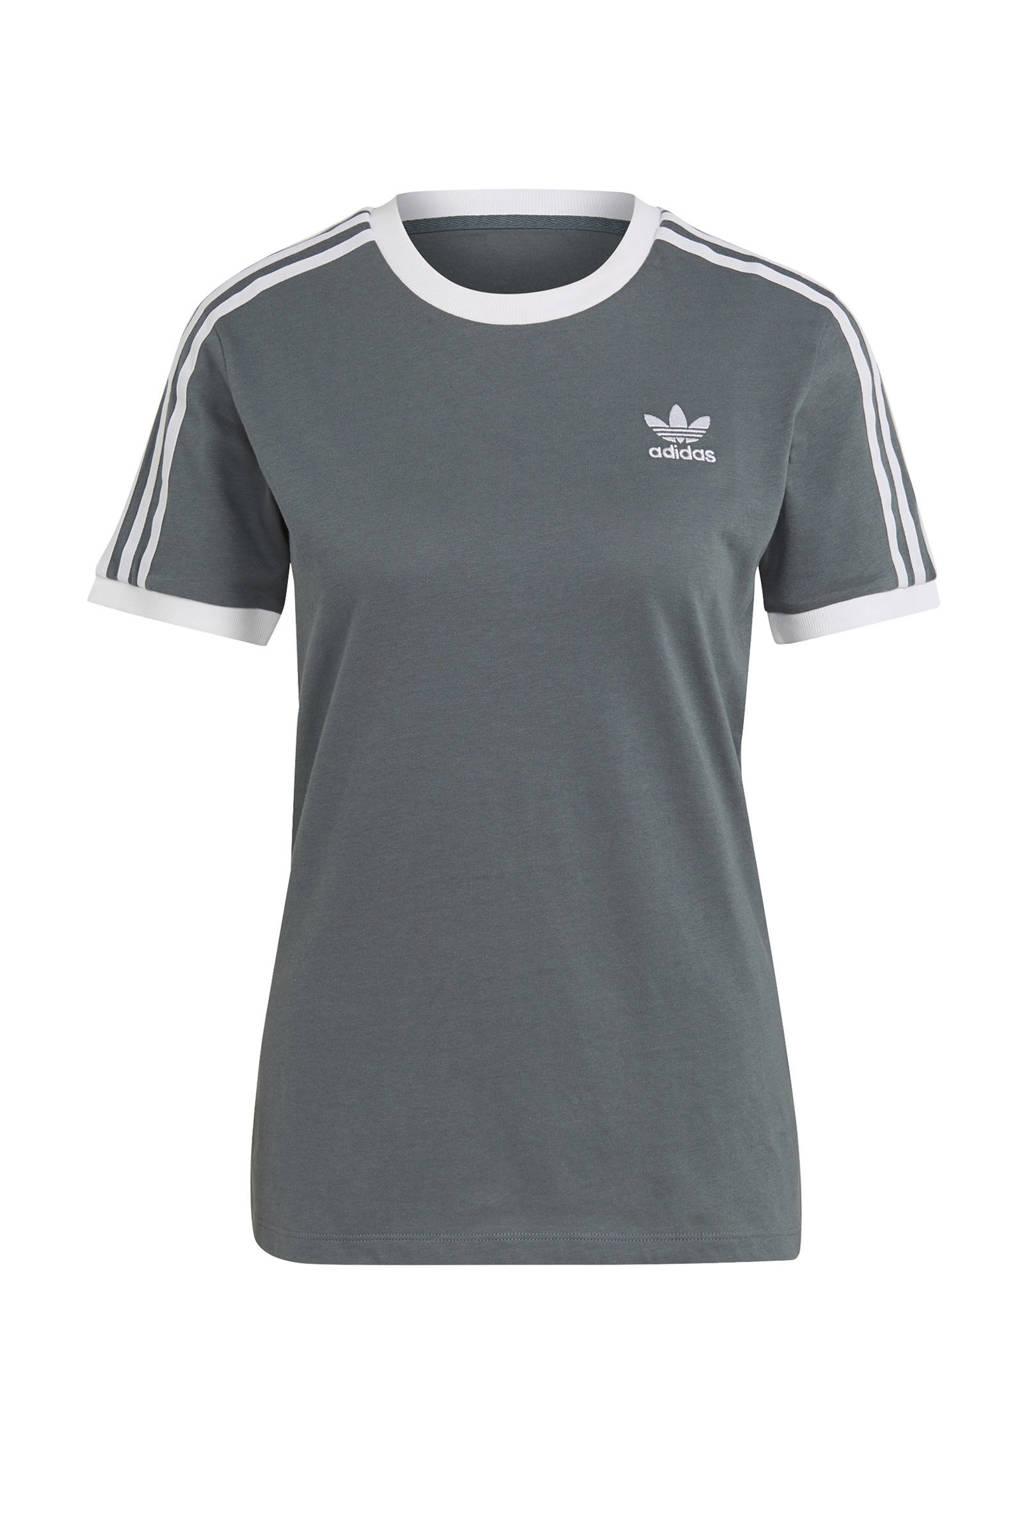 adidas Originals Adicolor T-shirt grijs/wit, Grijs/wit